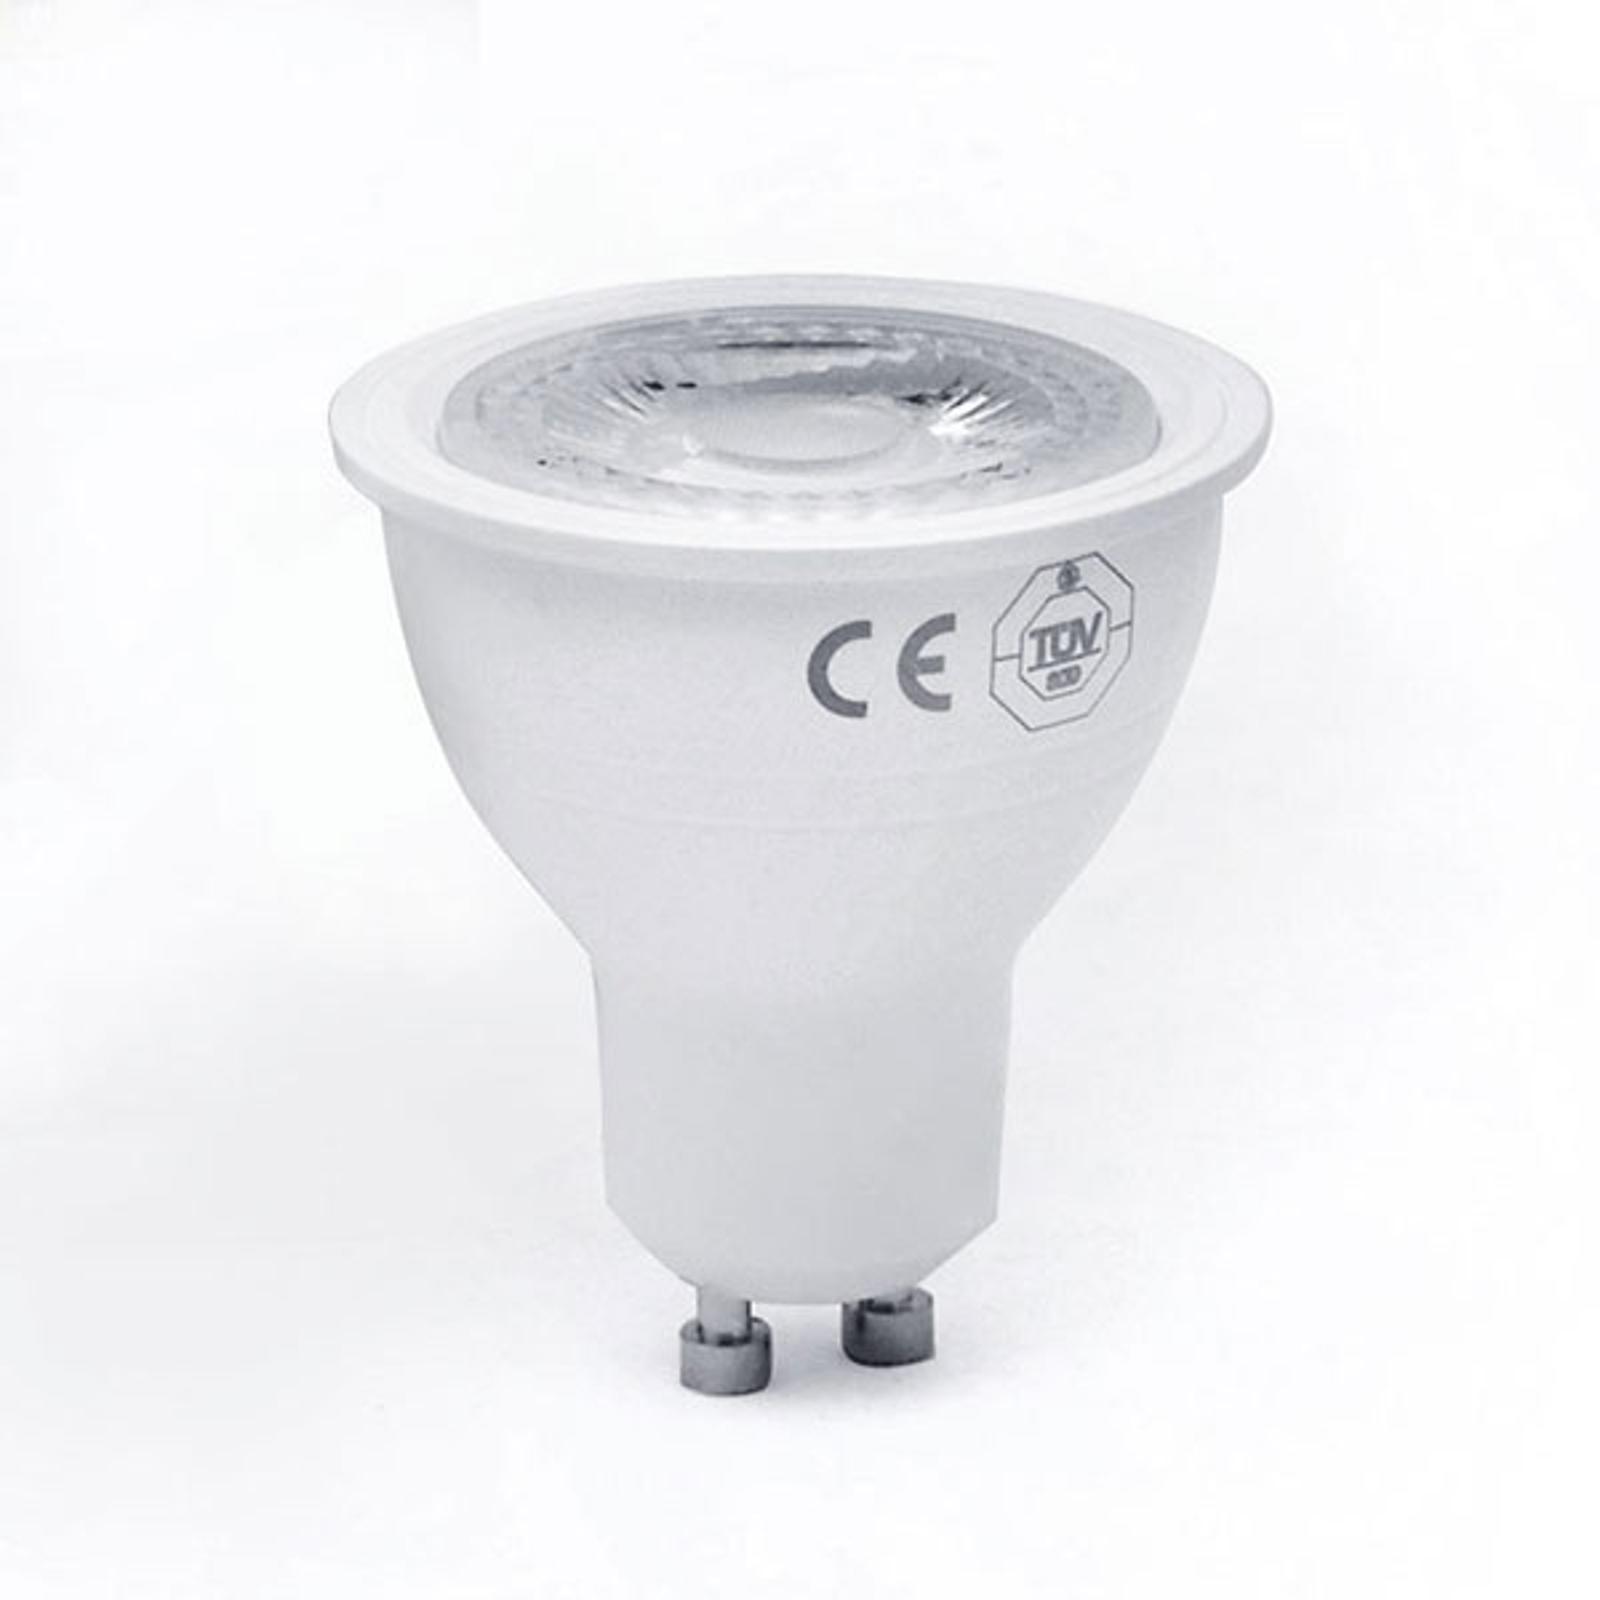 Reflector LED bulb GU10 CCT_3538140_1